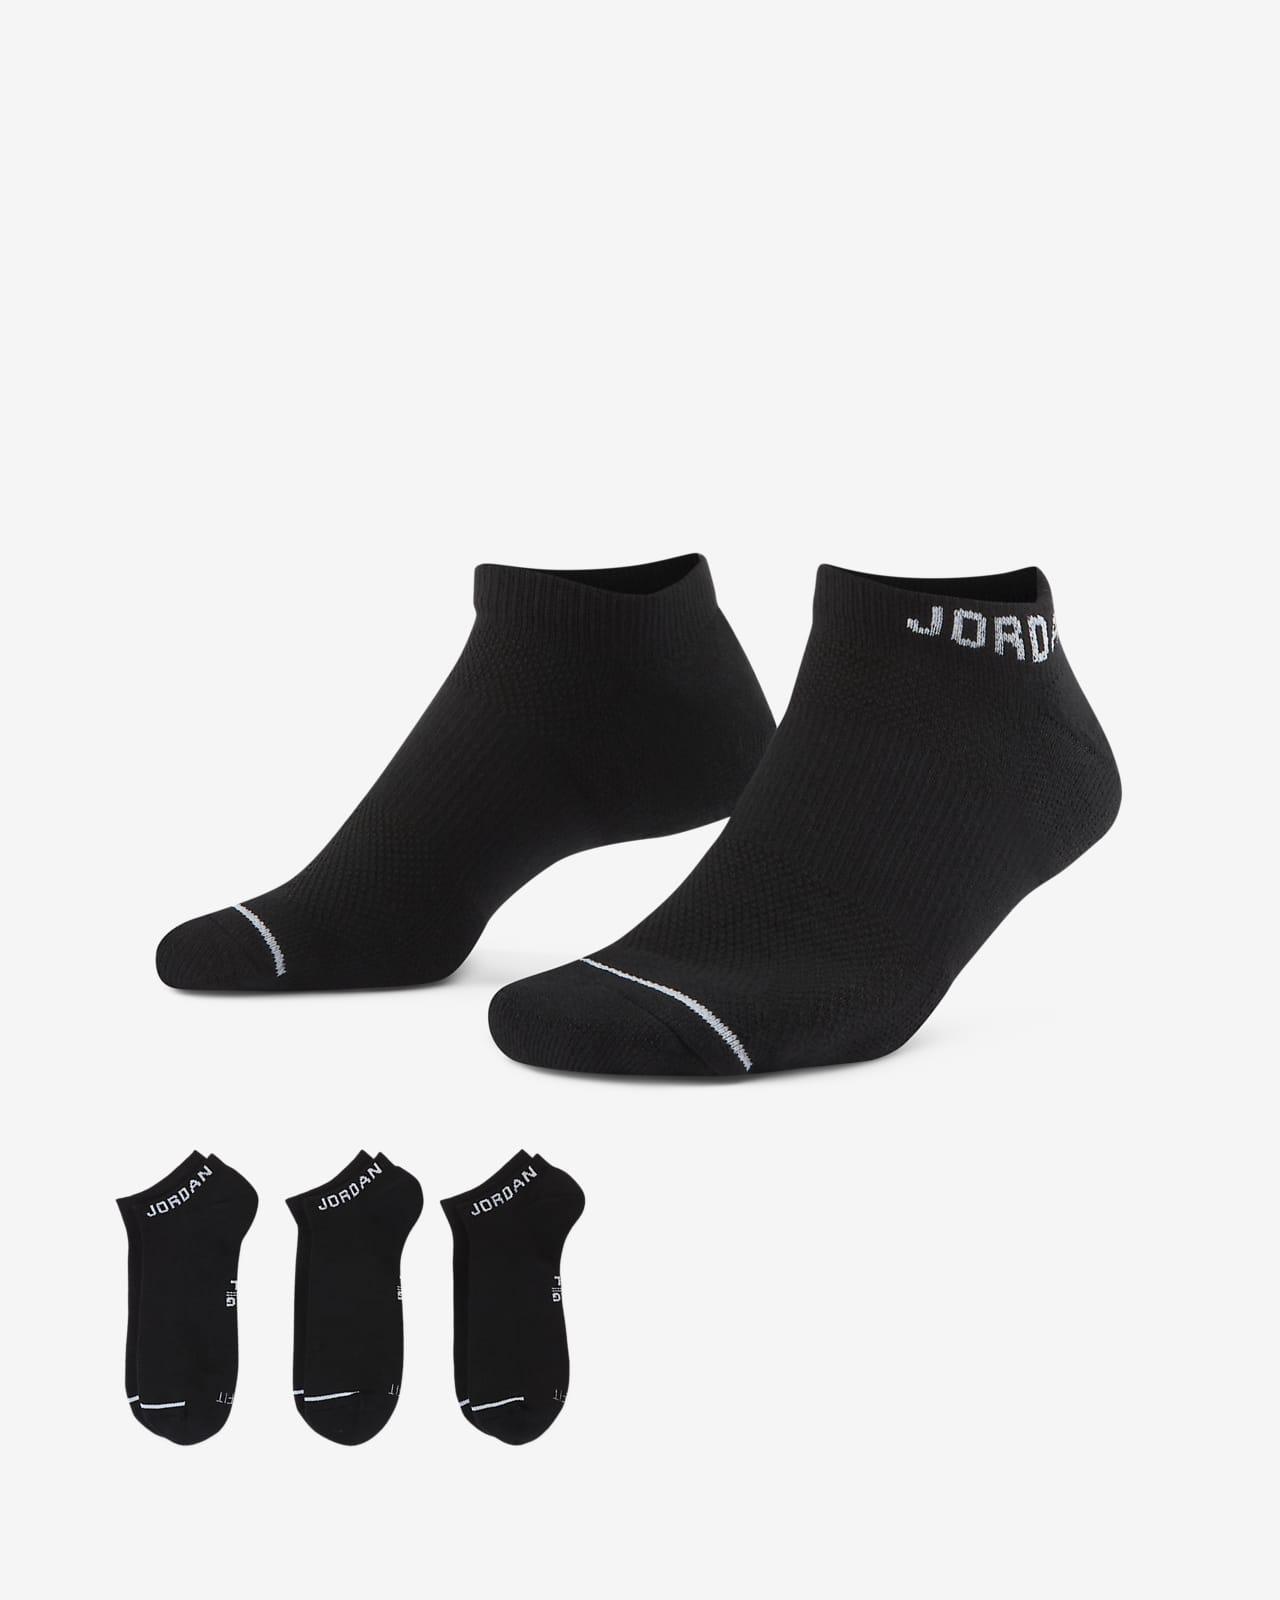 Calcetines invisibles unisex Jordan Everyday Max (3 pares)